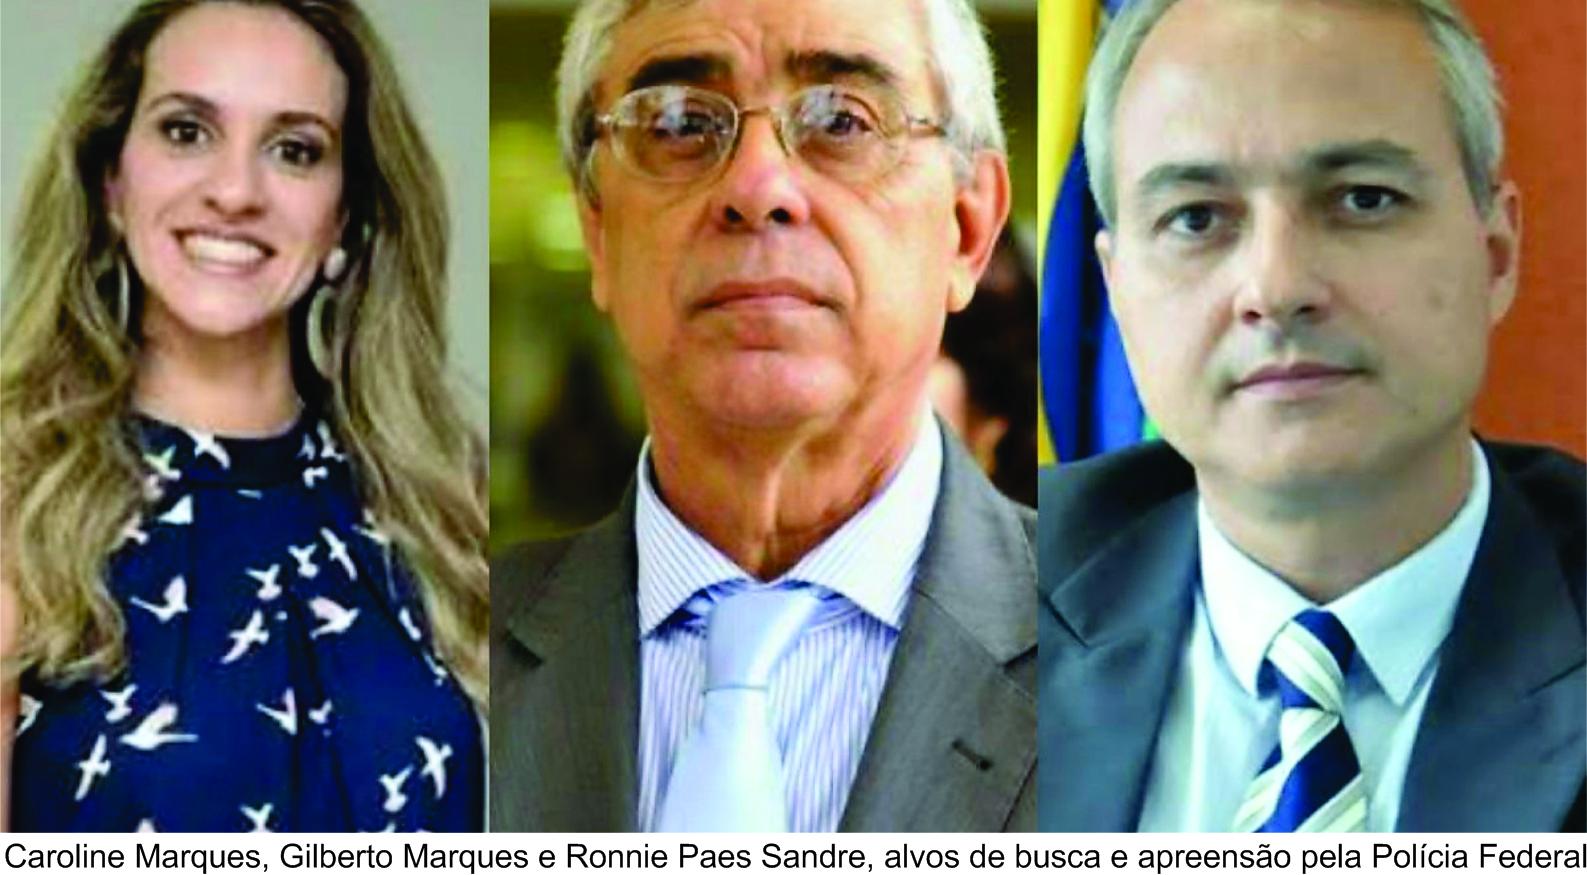 A lama esparramada pelo Tribunal de Justiça de Goiás